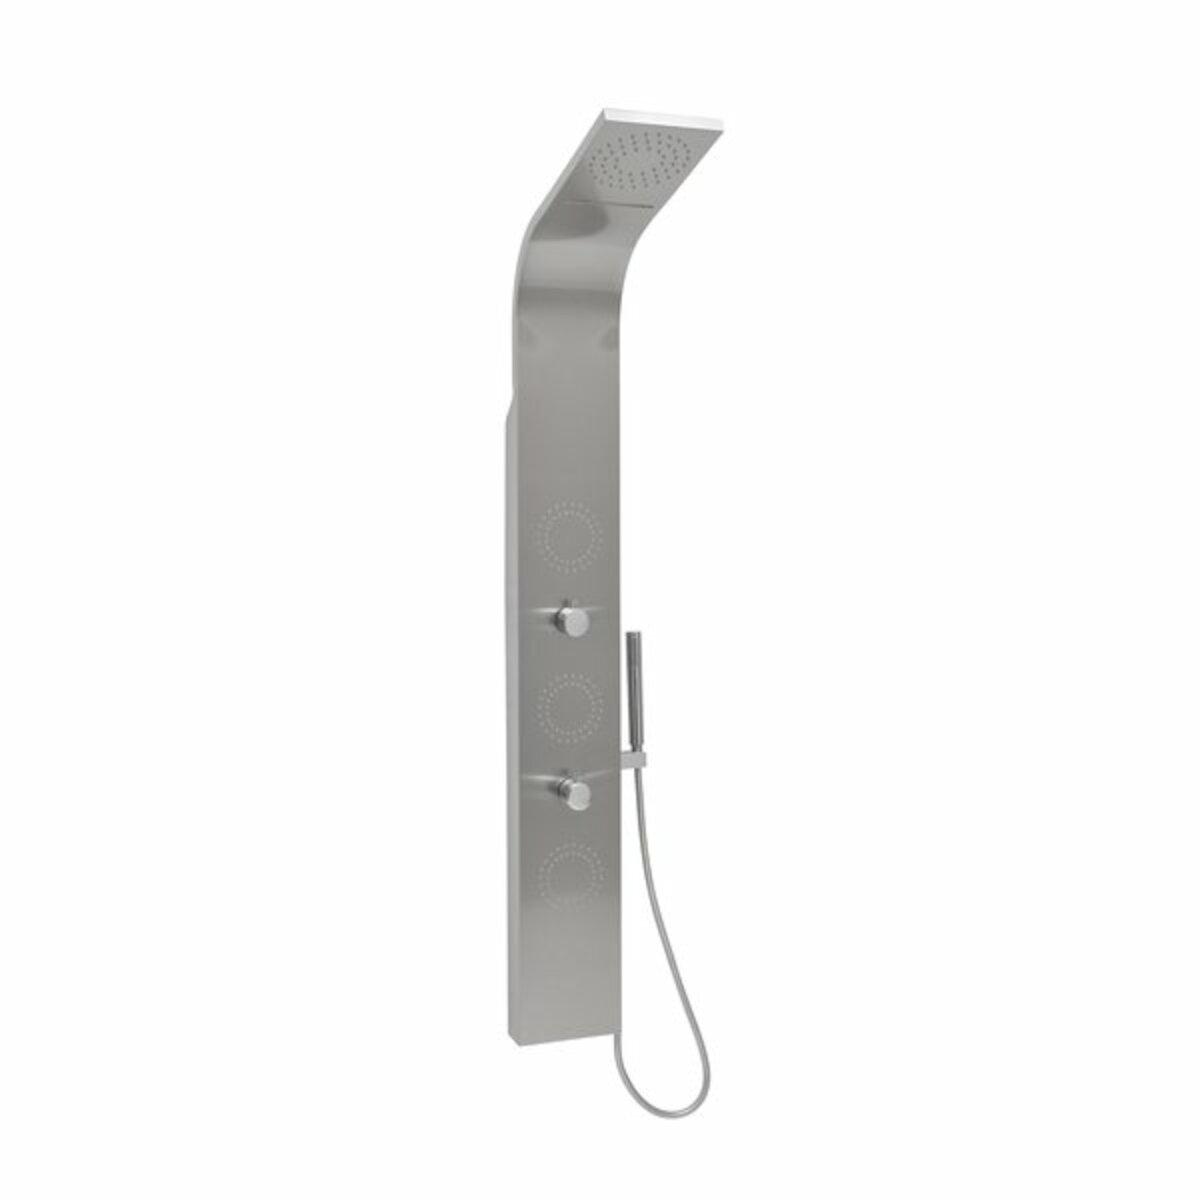 Sprchový panel Ravak Jet Inox na stěnu chrom X01453